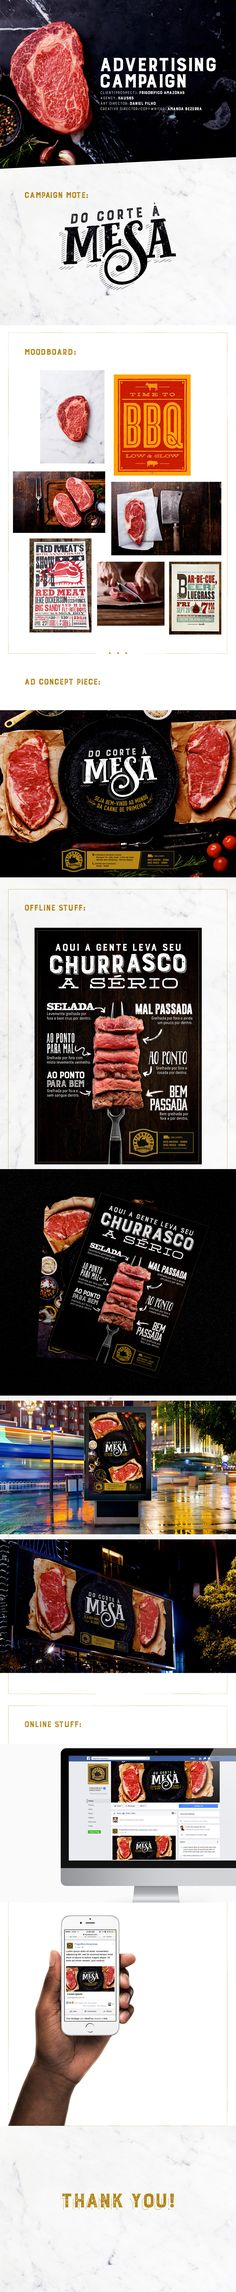 https://www.behance.net/gallery/56652013/Do-corte-a-mesa-Advertising-Campaign